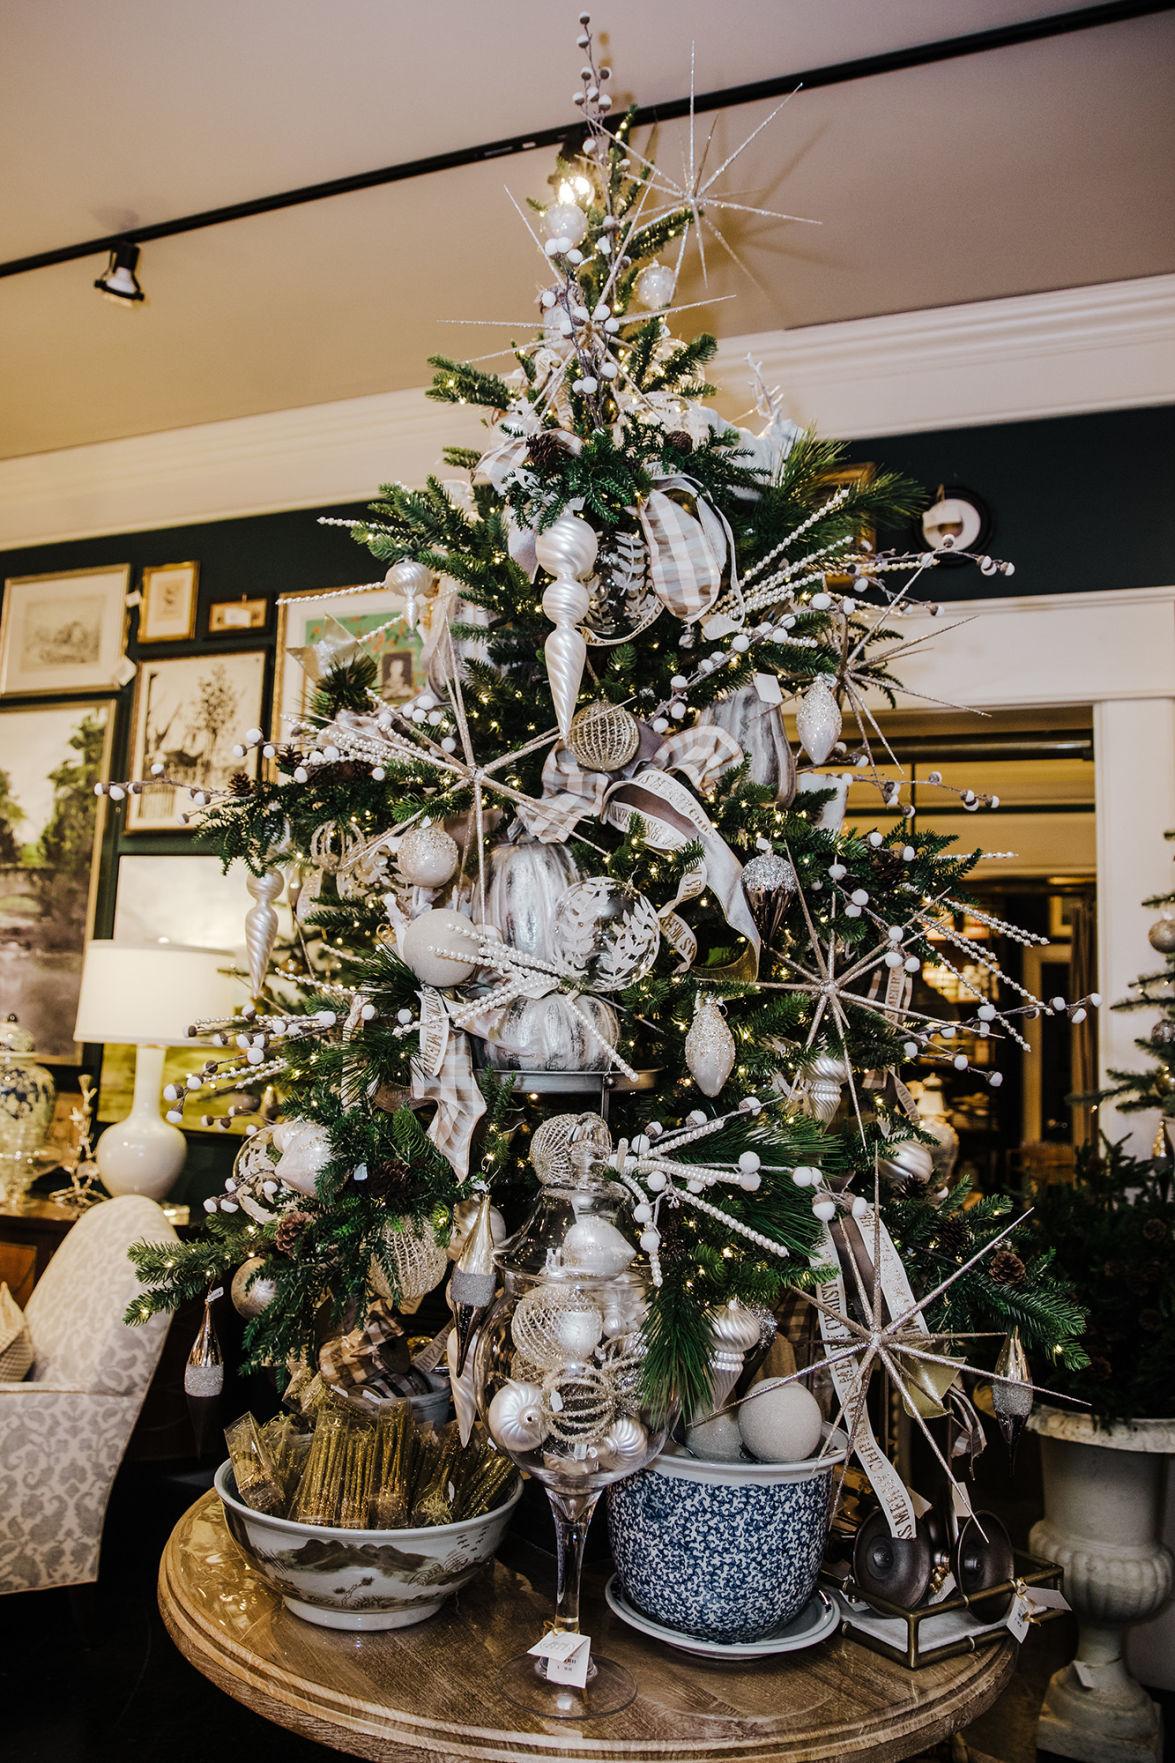 Metallic tree for the season